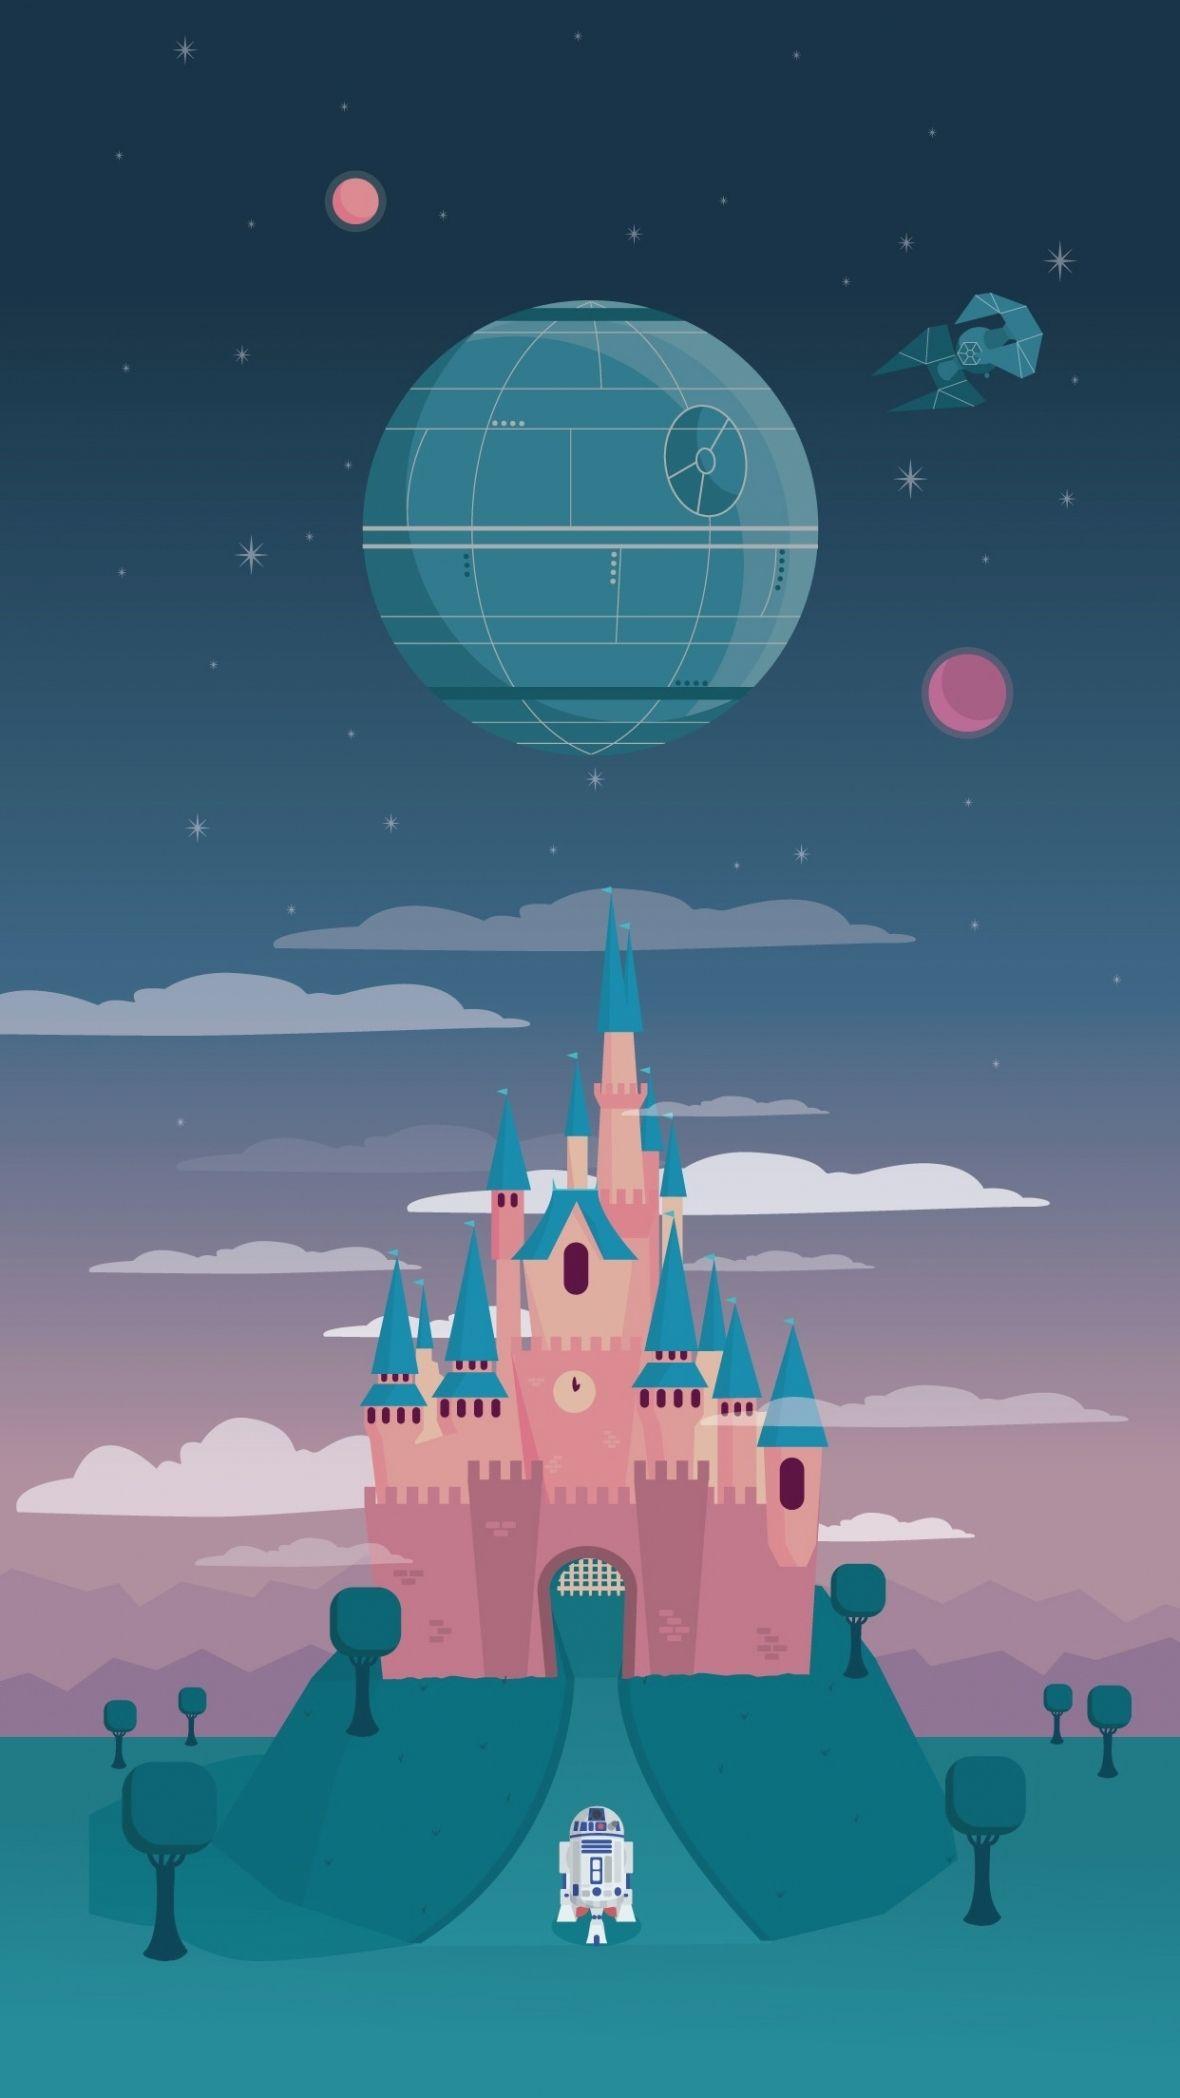 Beautiful Wallpaper Home Screen Disney - 15a1b7385502775d1c8410c9fd923947  Gallery_246032.jpg